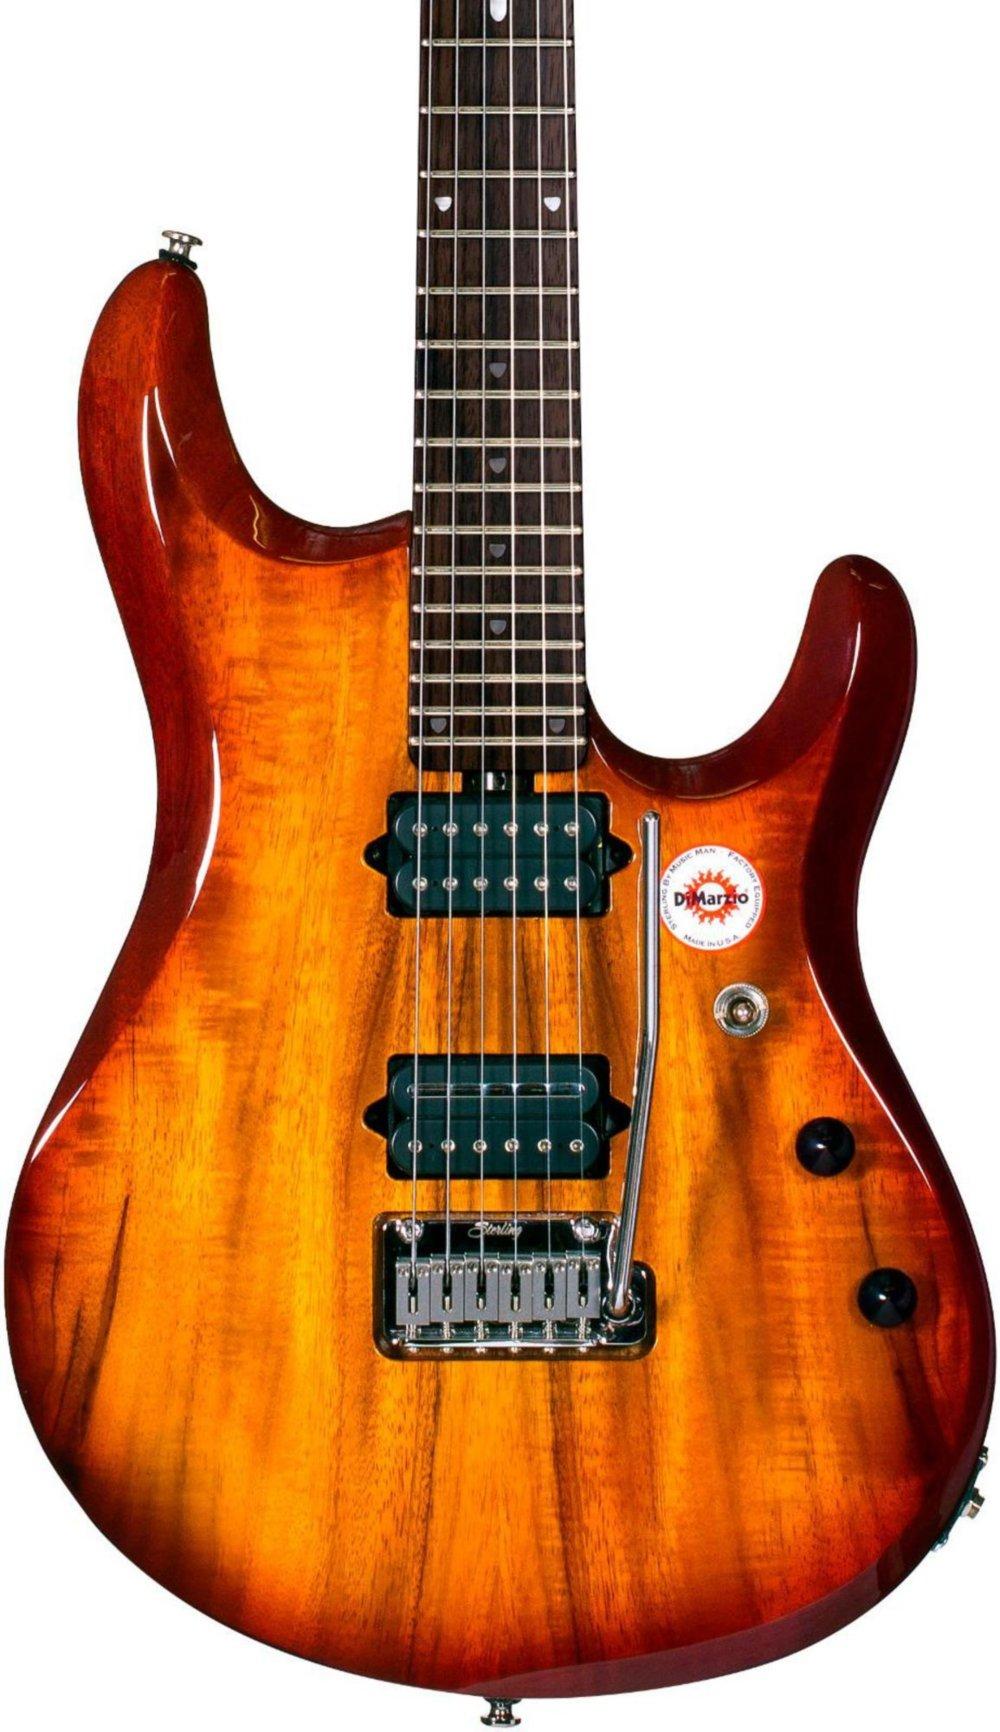 Sterling by Music Man JP100D John Petrucci Signature Series Koa Top Dimarzio Pickups Electric Guitar Natural